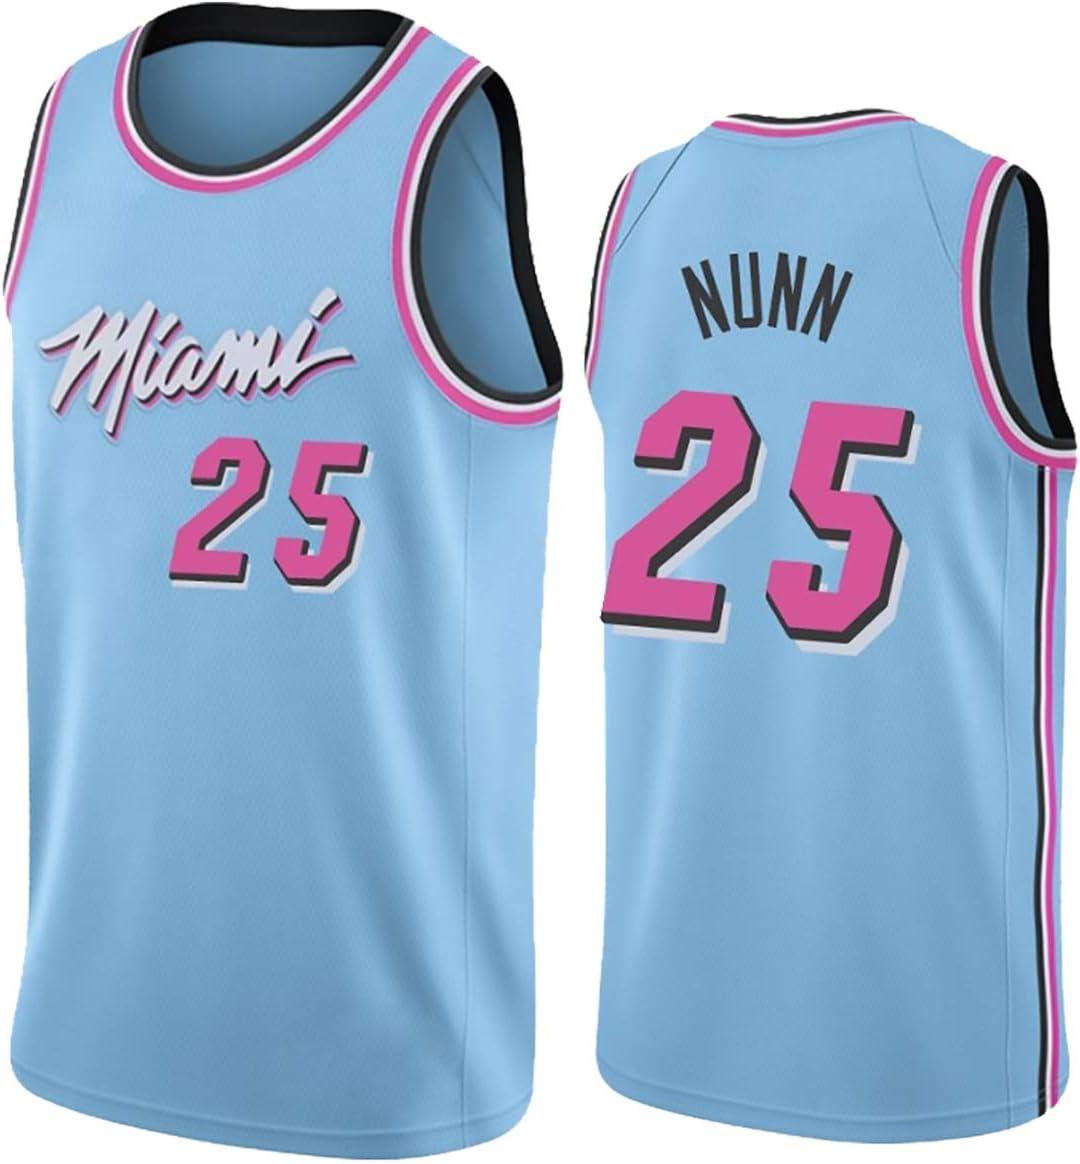 Neue Stoff Unisex T-Shirt Uniform MAZOSPORT Herren Basketball Trikots Miami Heat Team 25